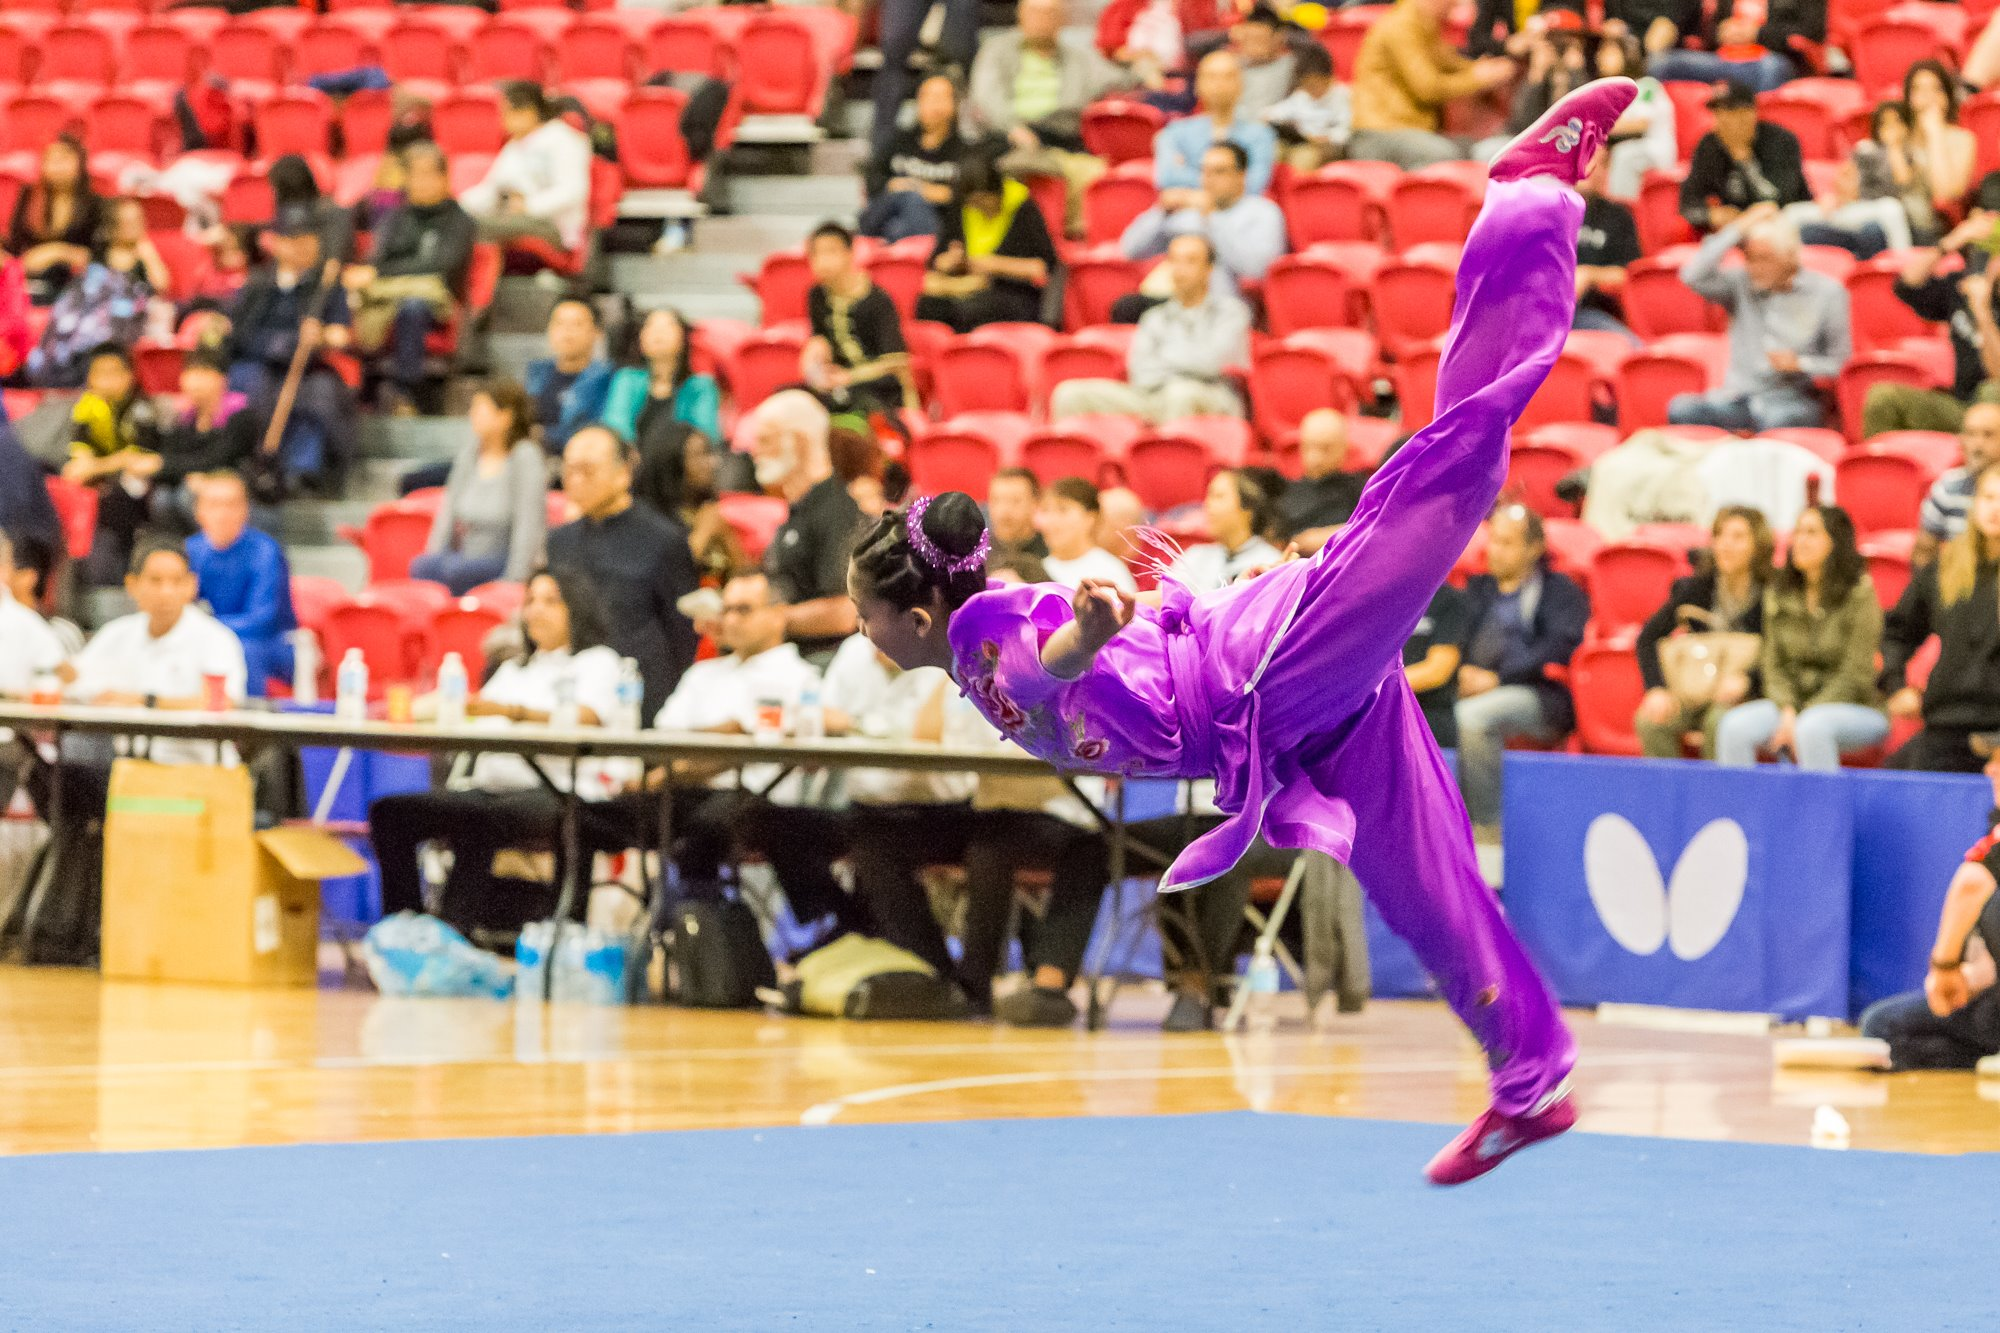 wayland-li-wushu-toronto-markham-canadian-wushu-championships-2017-jianshu-16.jpg